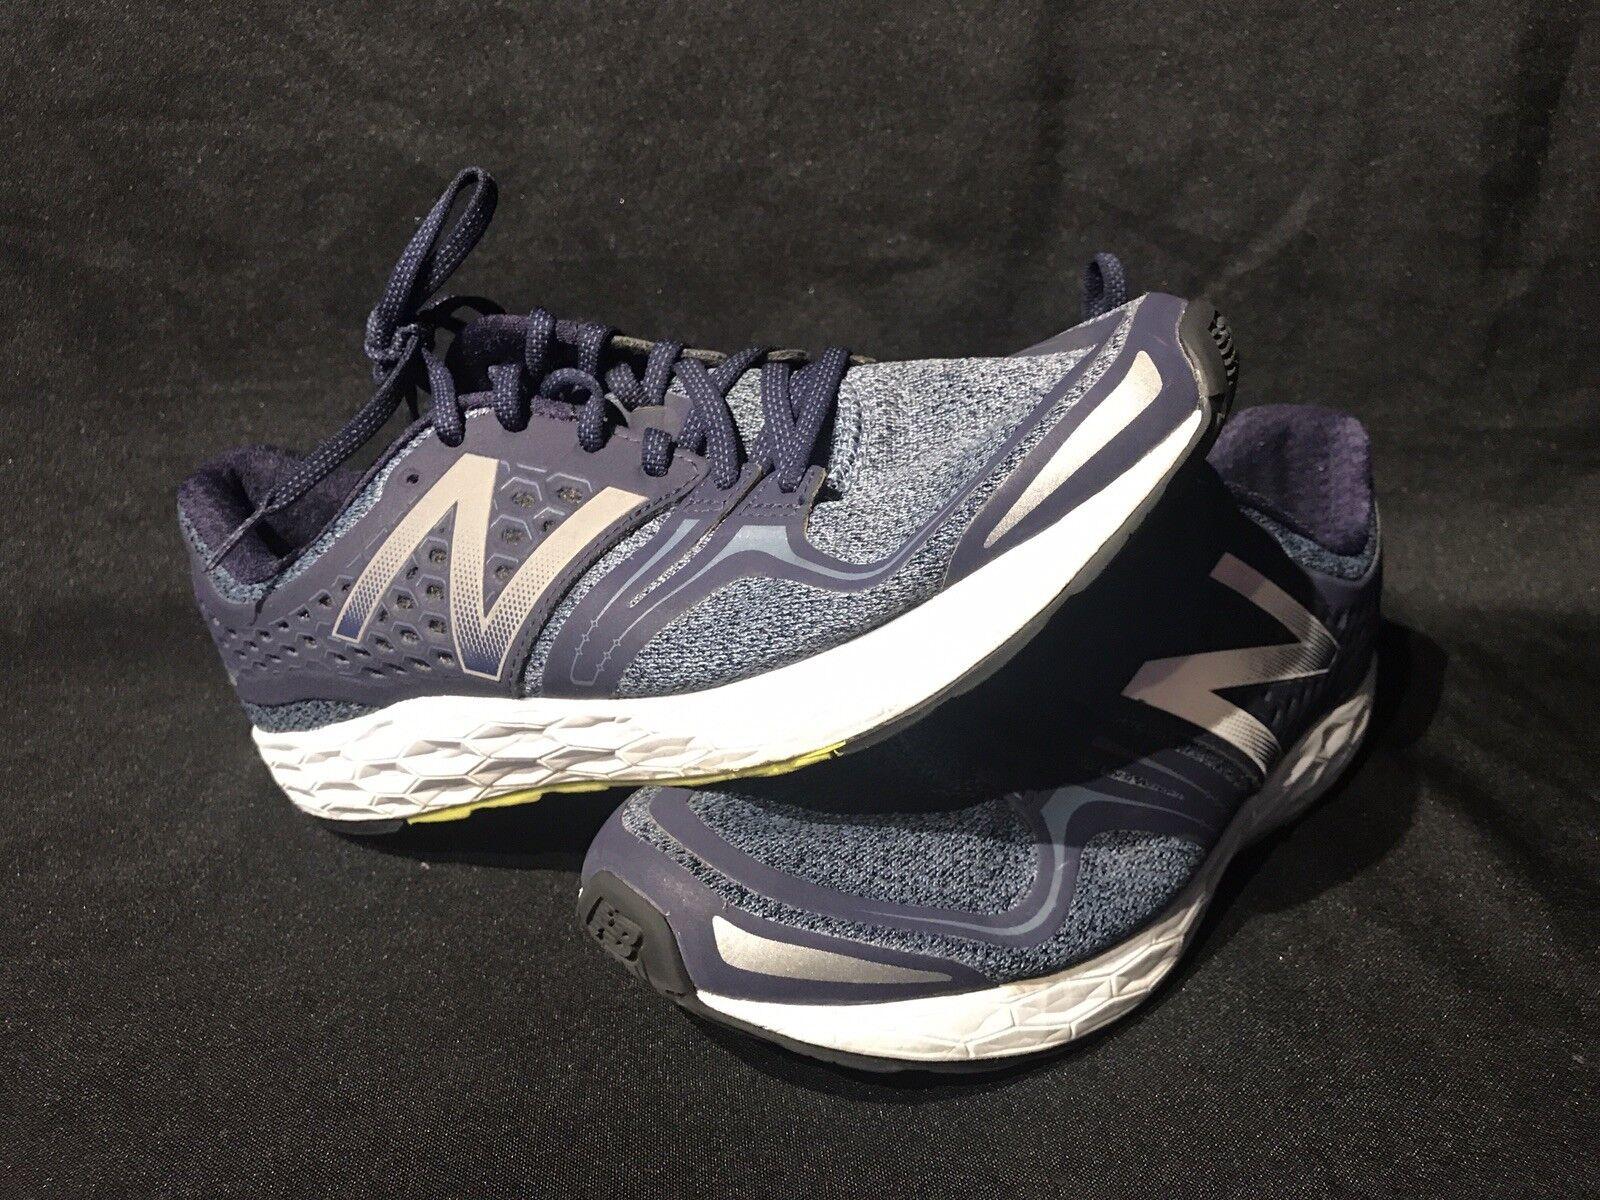 New Balance Women's Fresh Foam Vongo WVNGOGY Running Shoes Sneakers Size 9 Blue